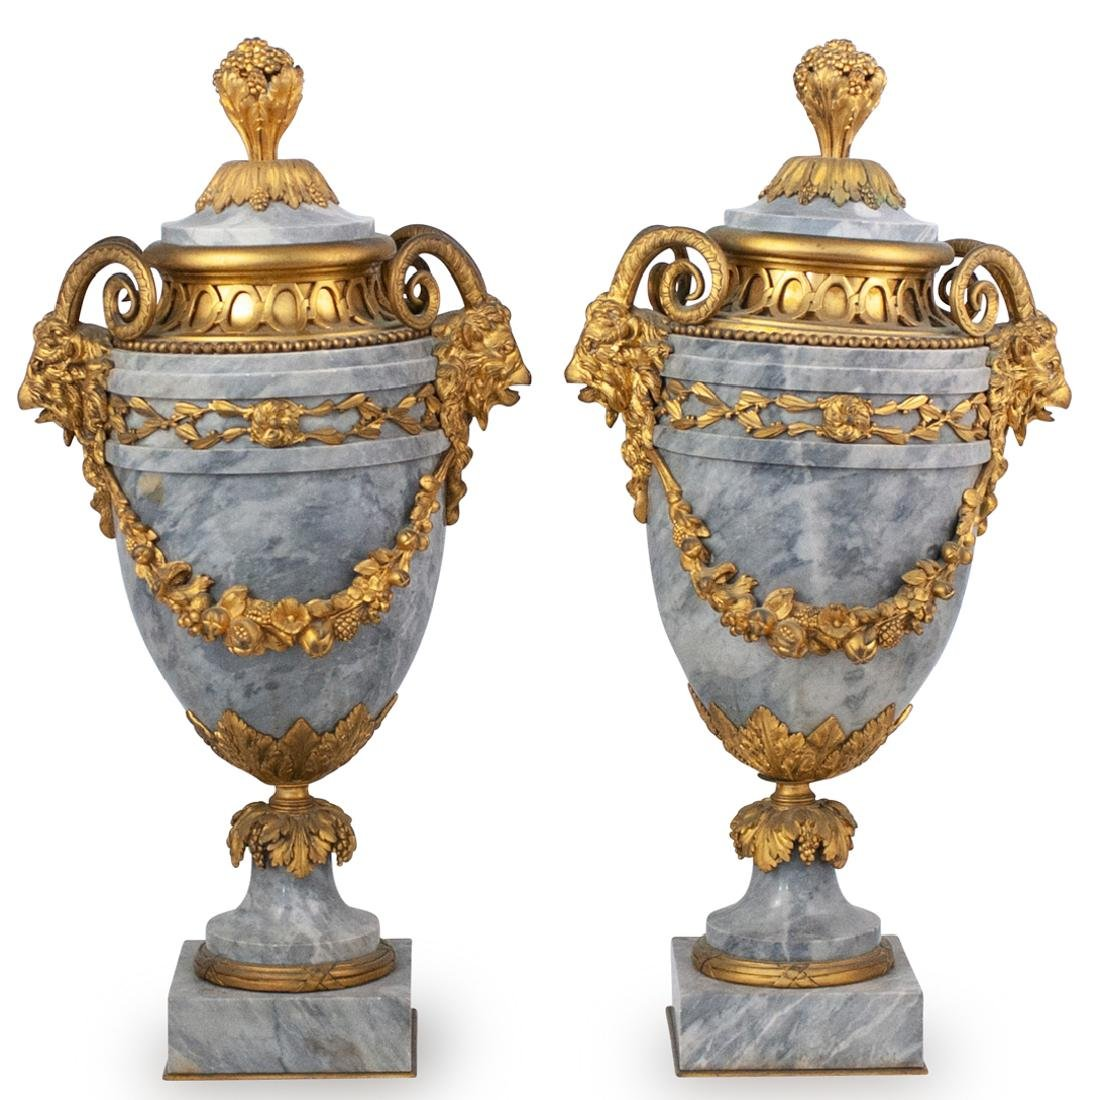 Pair of Louis XVI Style Grey Marble Urns